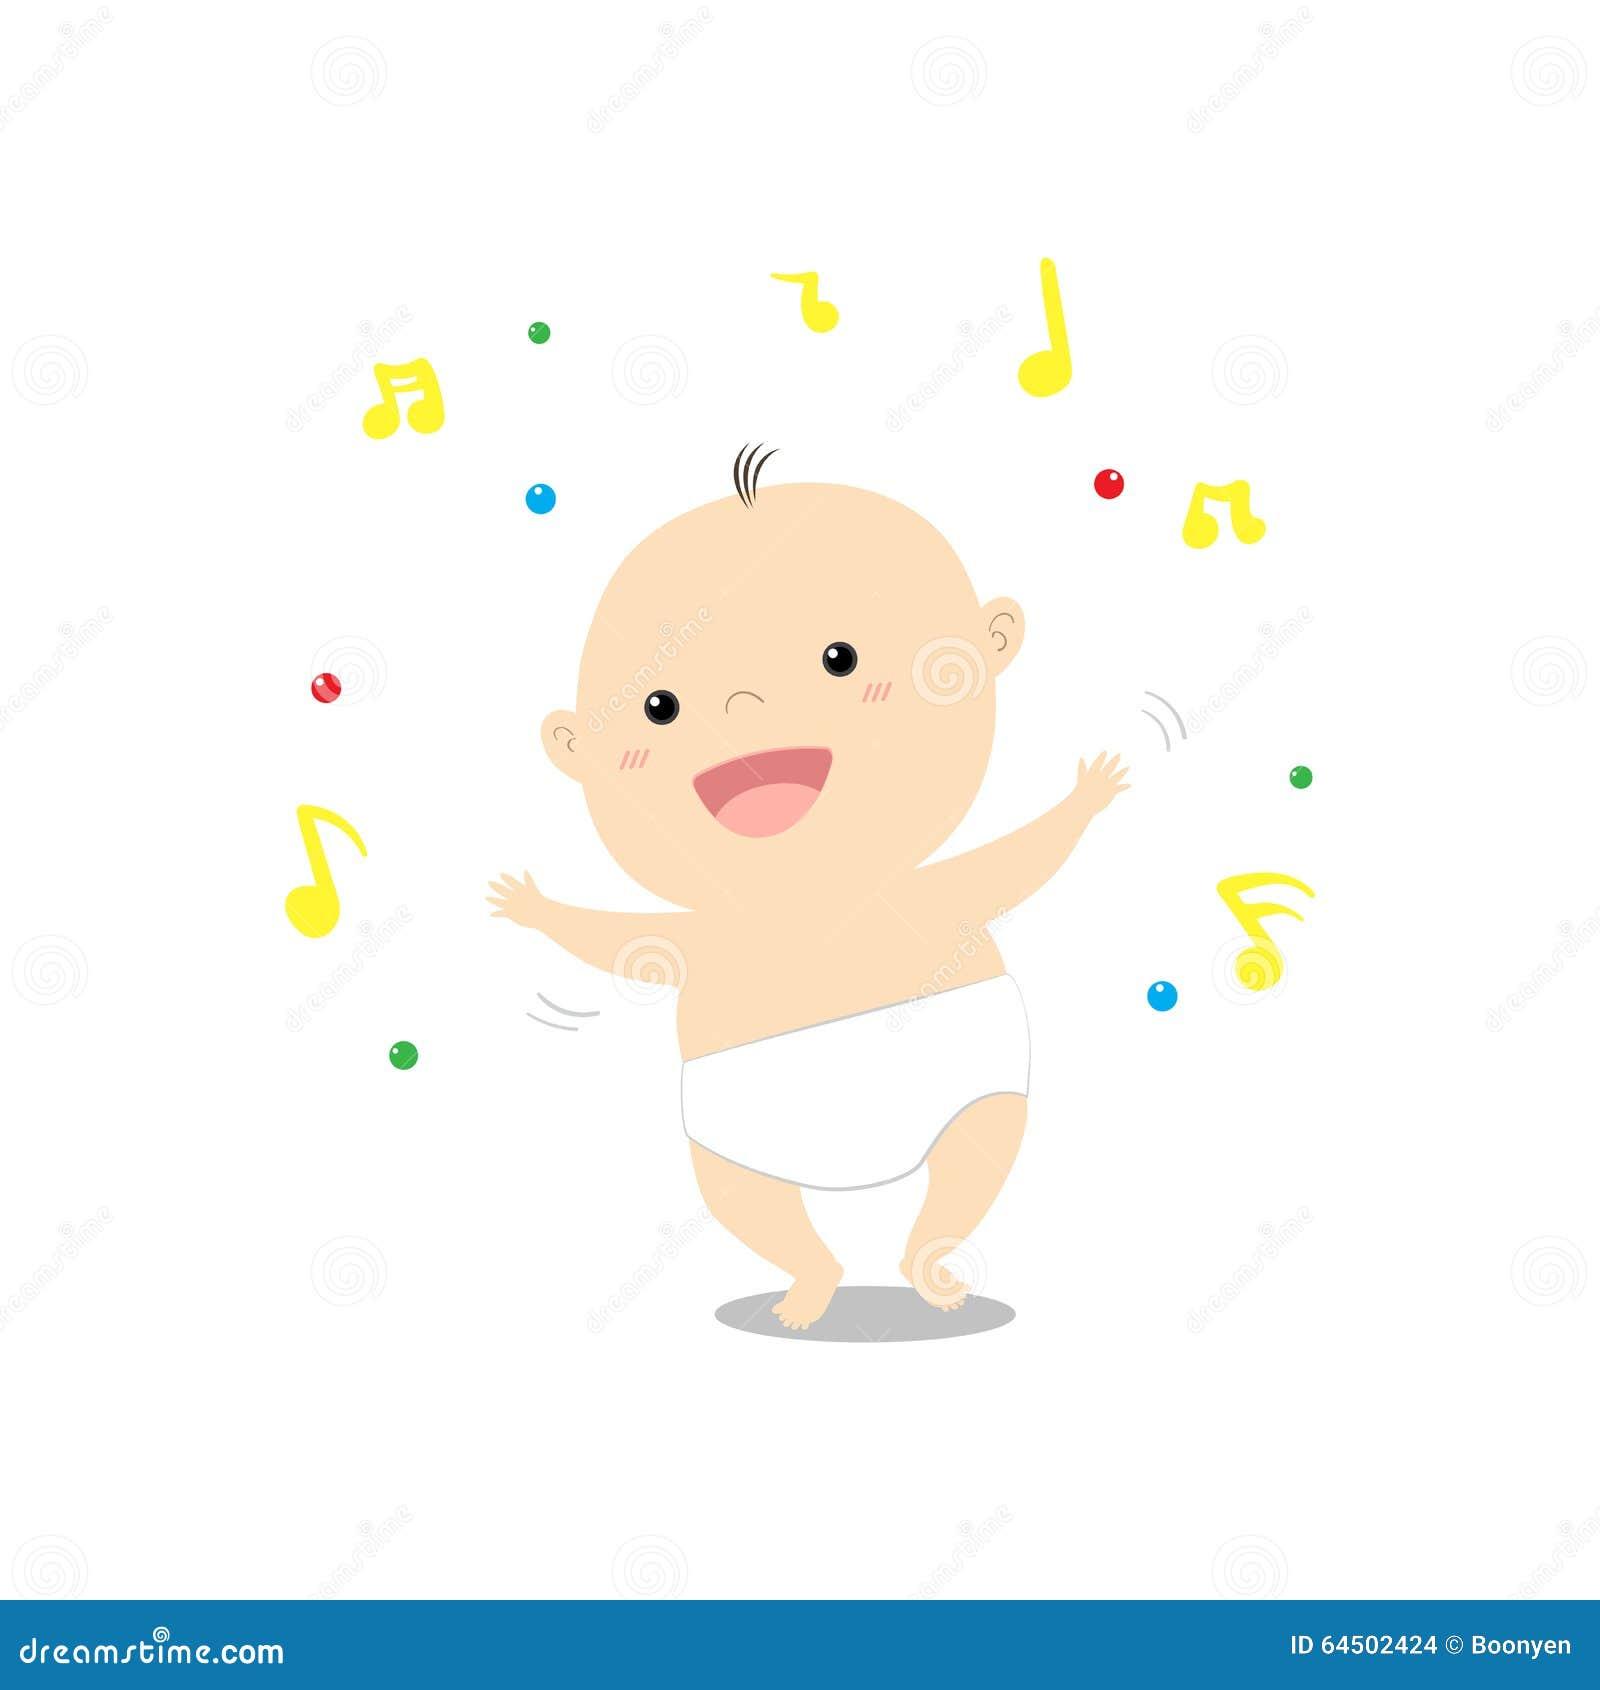 Dancing Babies Cute: Cute Cartoon Baby Dancing Happily Music Illustration Stock